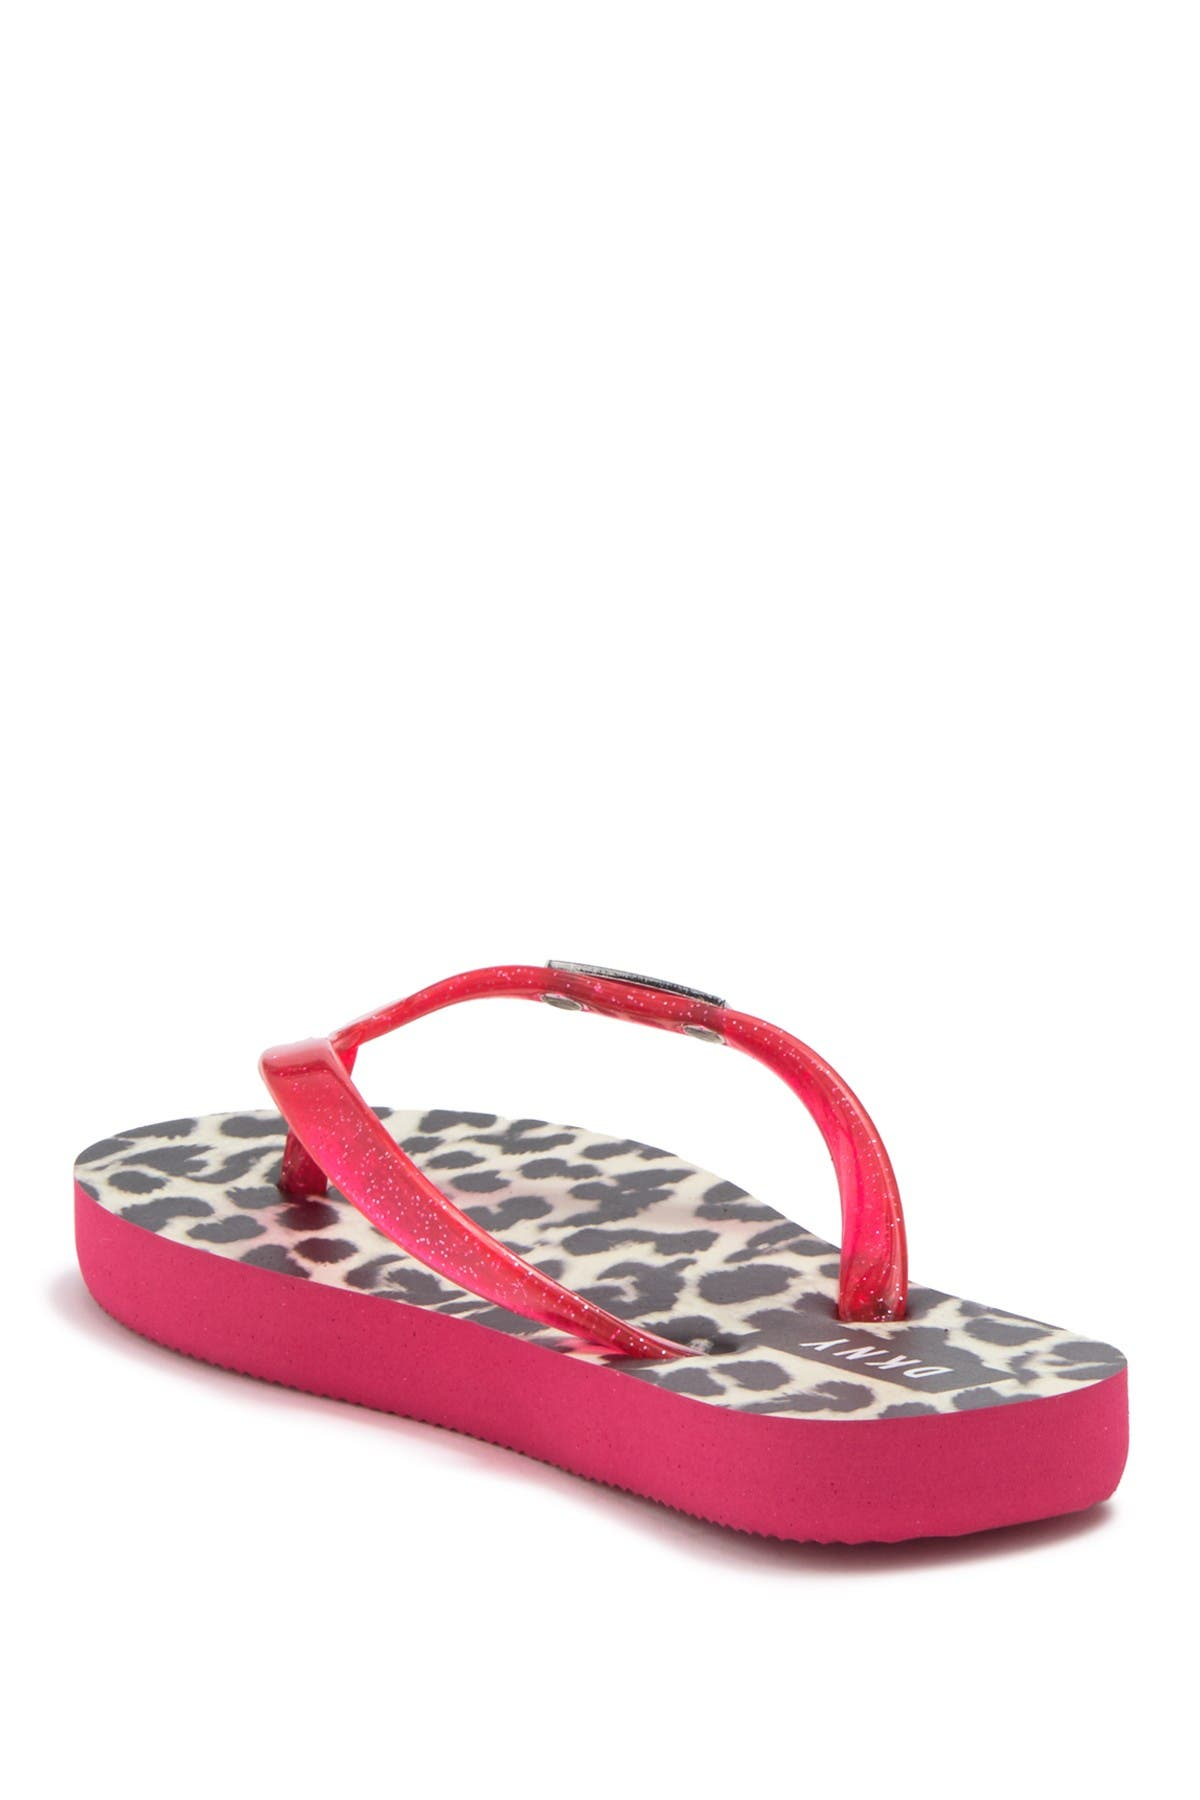 Image of DKNY Zoey Flip Flop